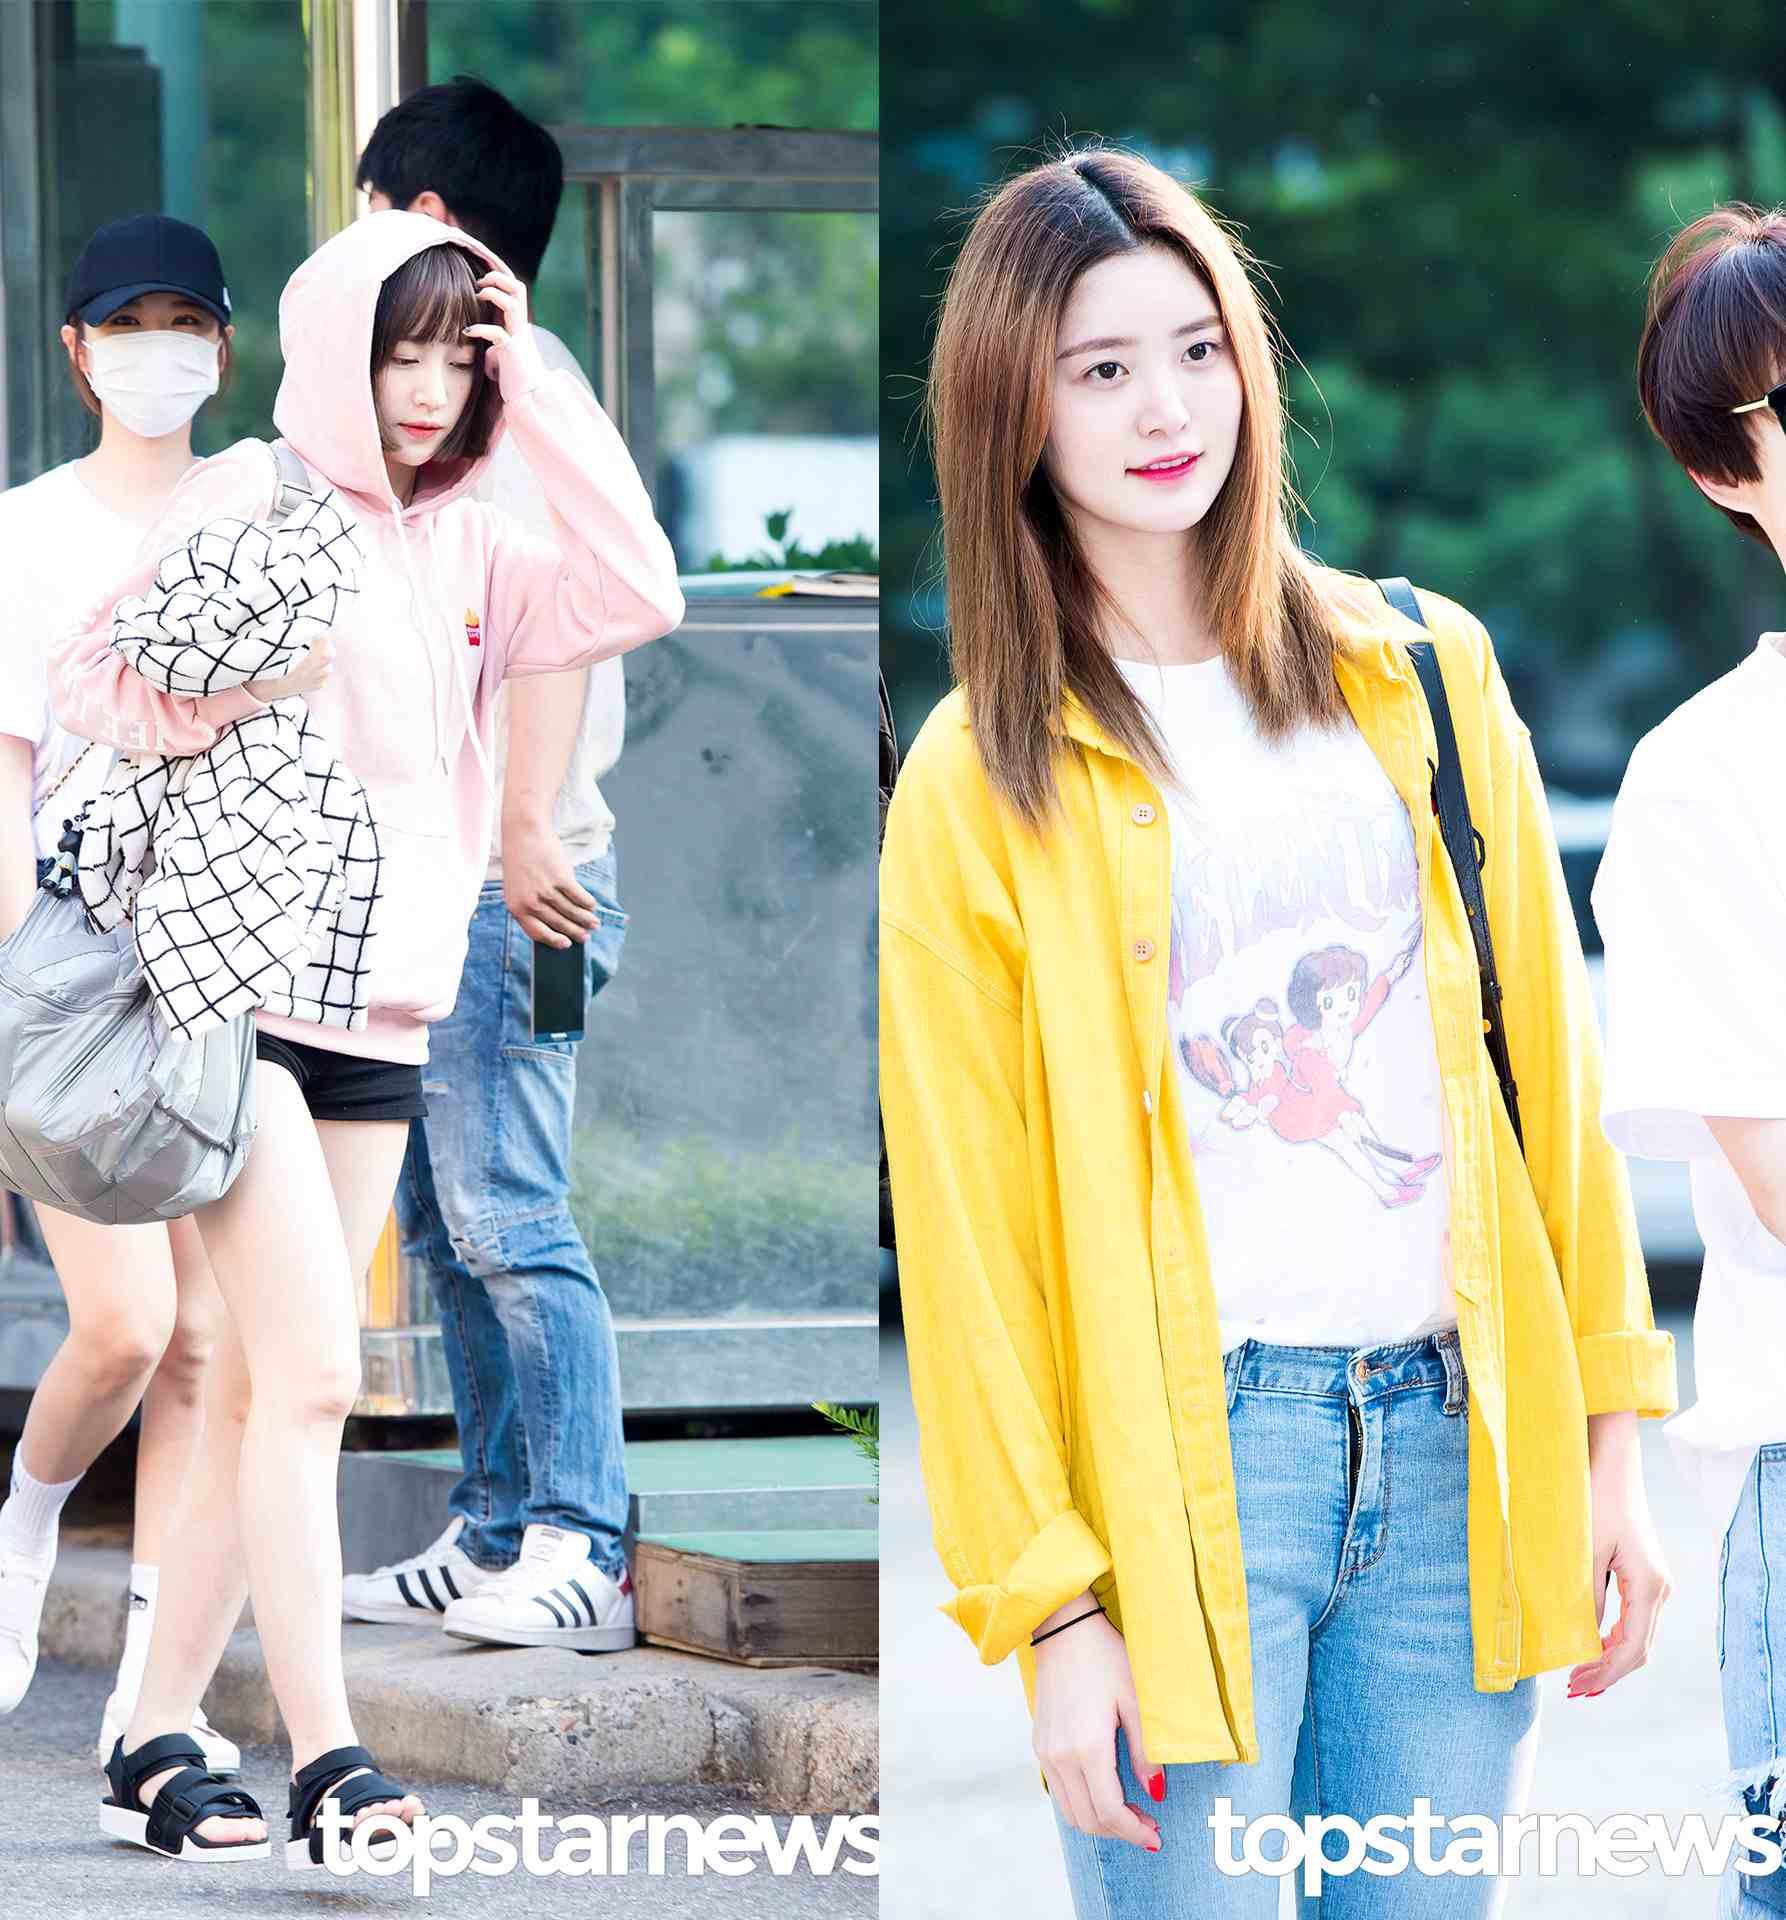 Style⑥ 下雨天 台灣夏天比較多雨,下雨天又會比較冷,可以像正花一樣外搭一件oversize的襯衫,或者像哈妮一樣穿一件連帽T都OK~~~